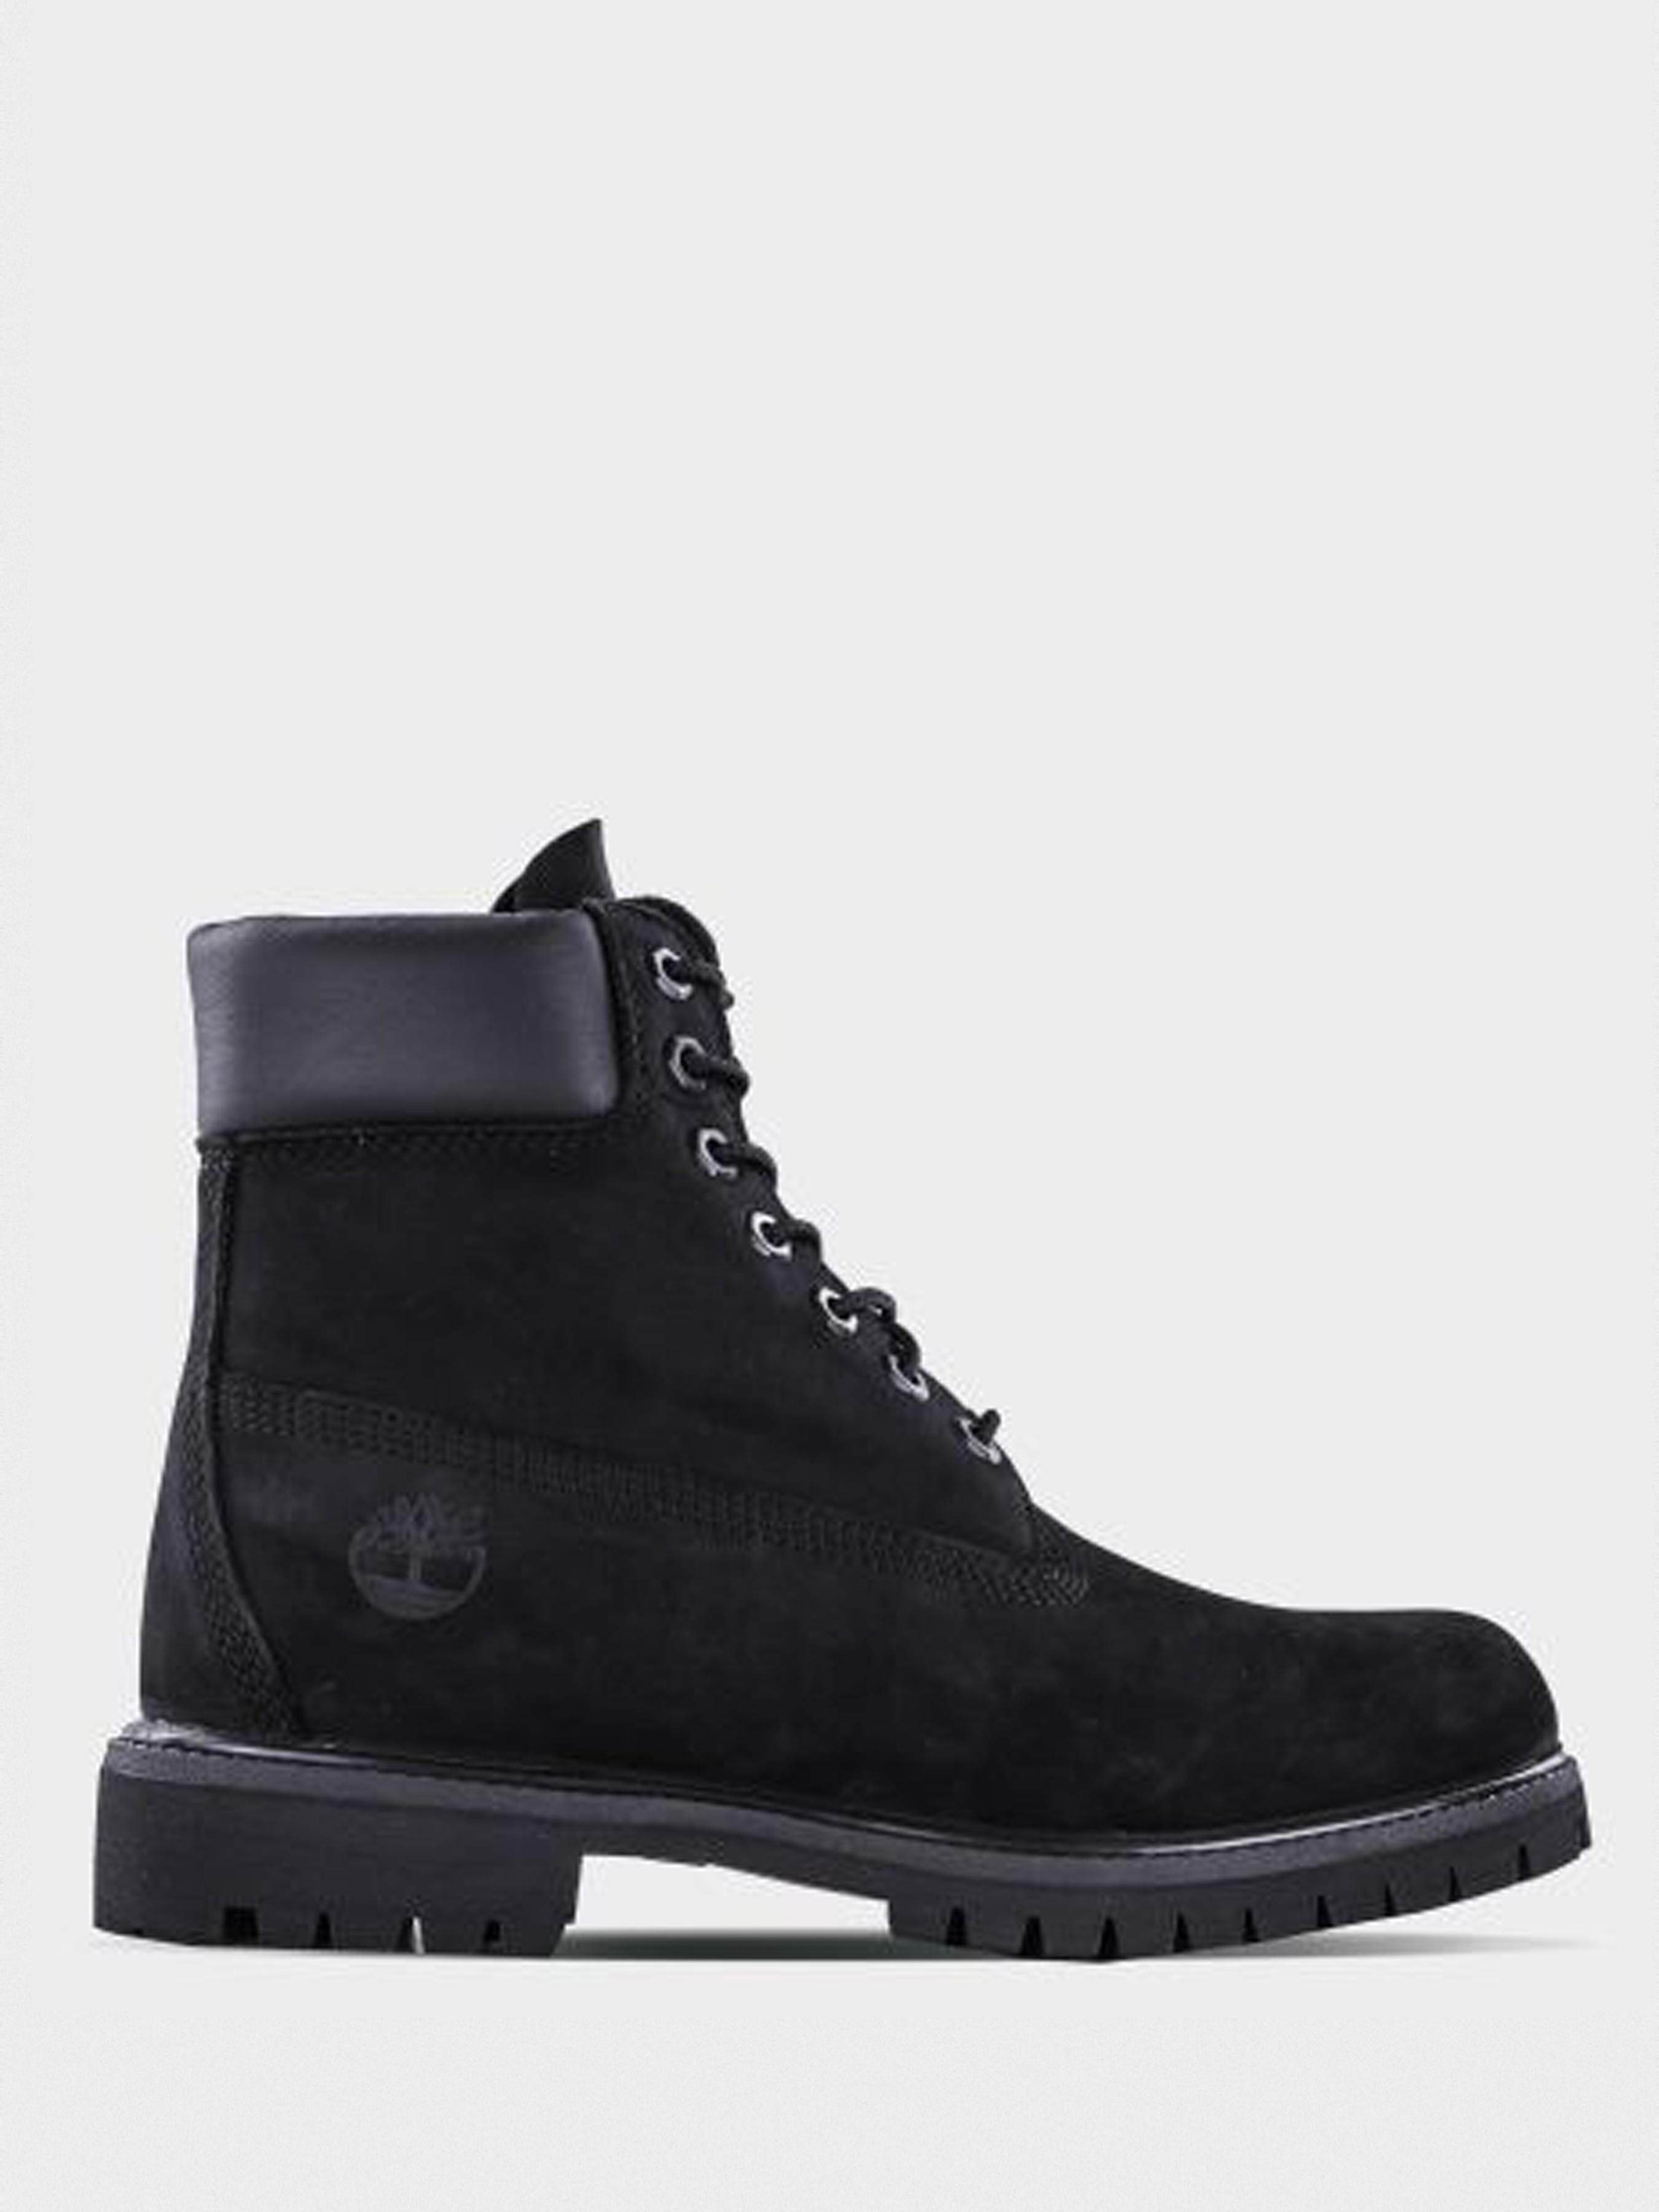 Купить Ботинки мужские Timberland Timberland Premium TF4042, Черный